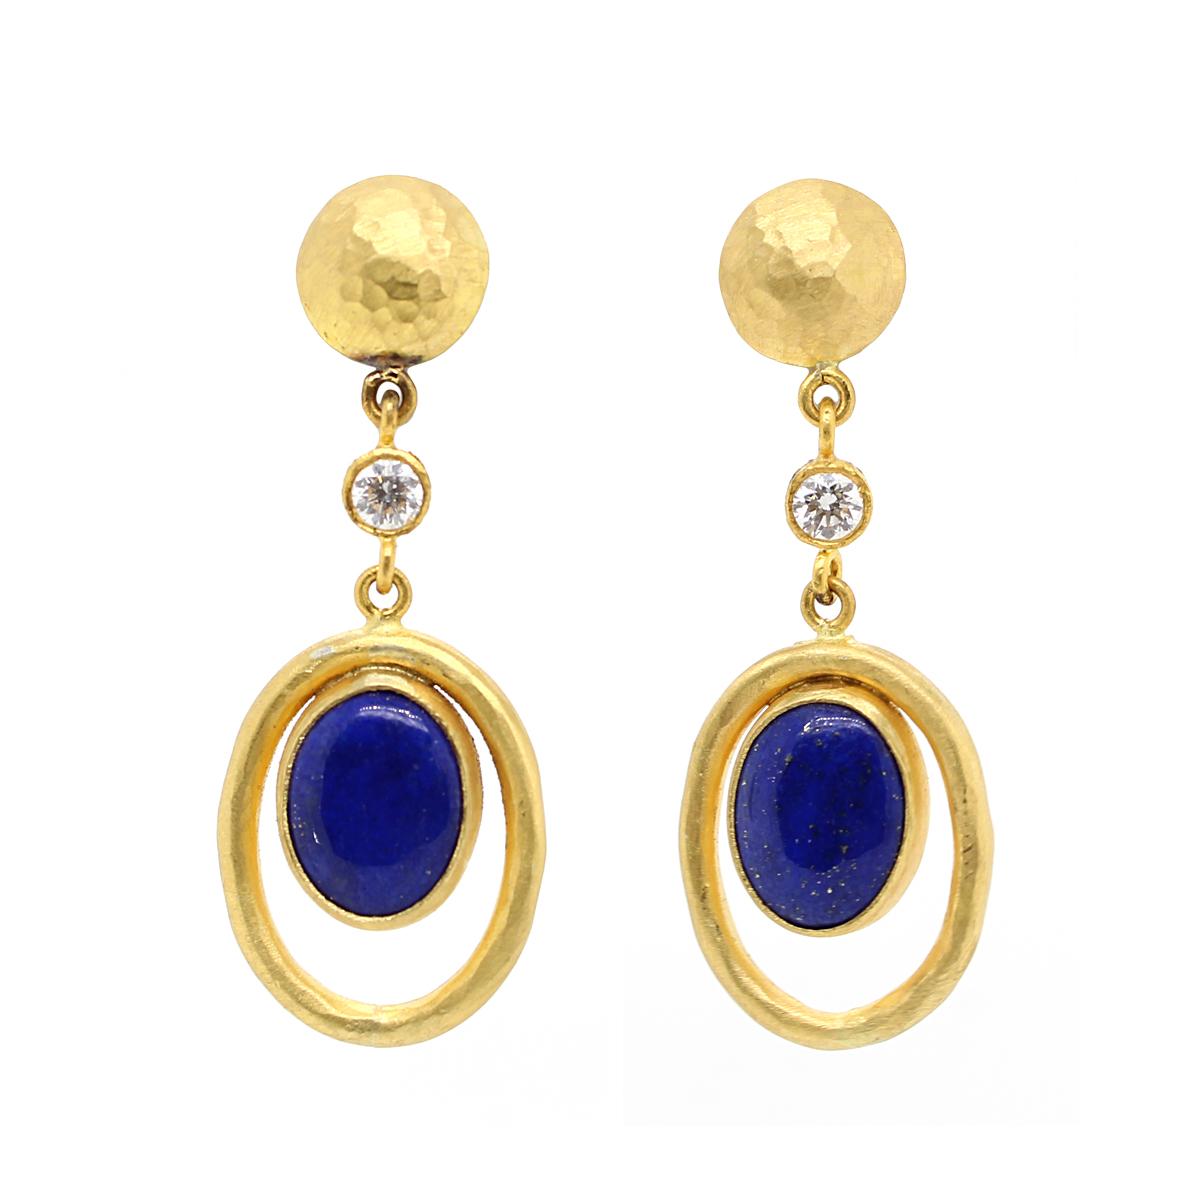 Lika Behar 22 Karat Yellow Gold Oval Lapis and Diamond Earrings